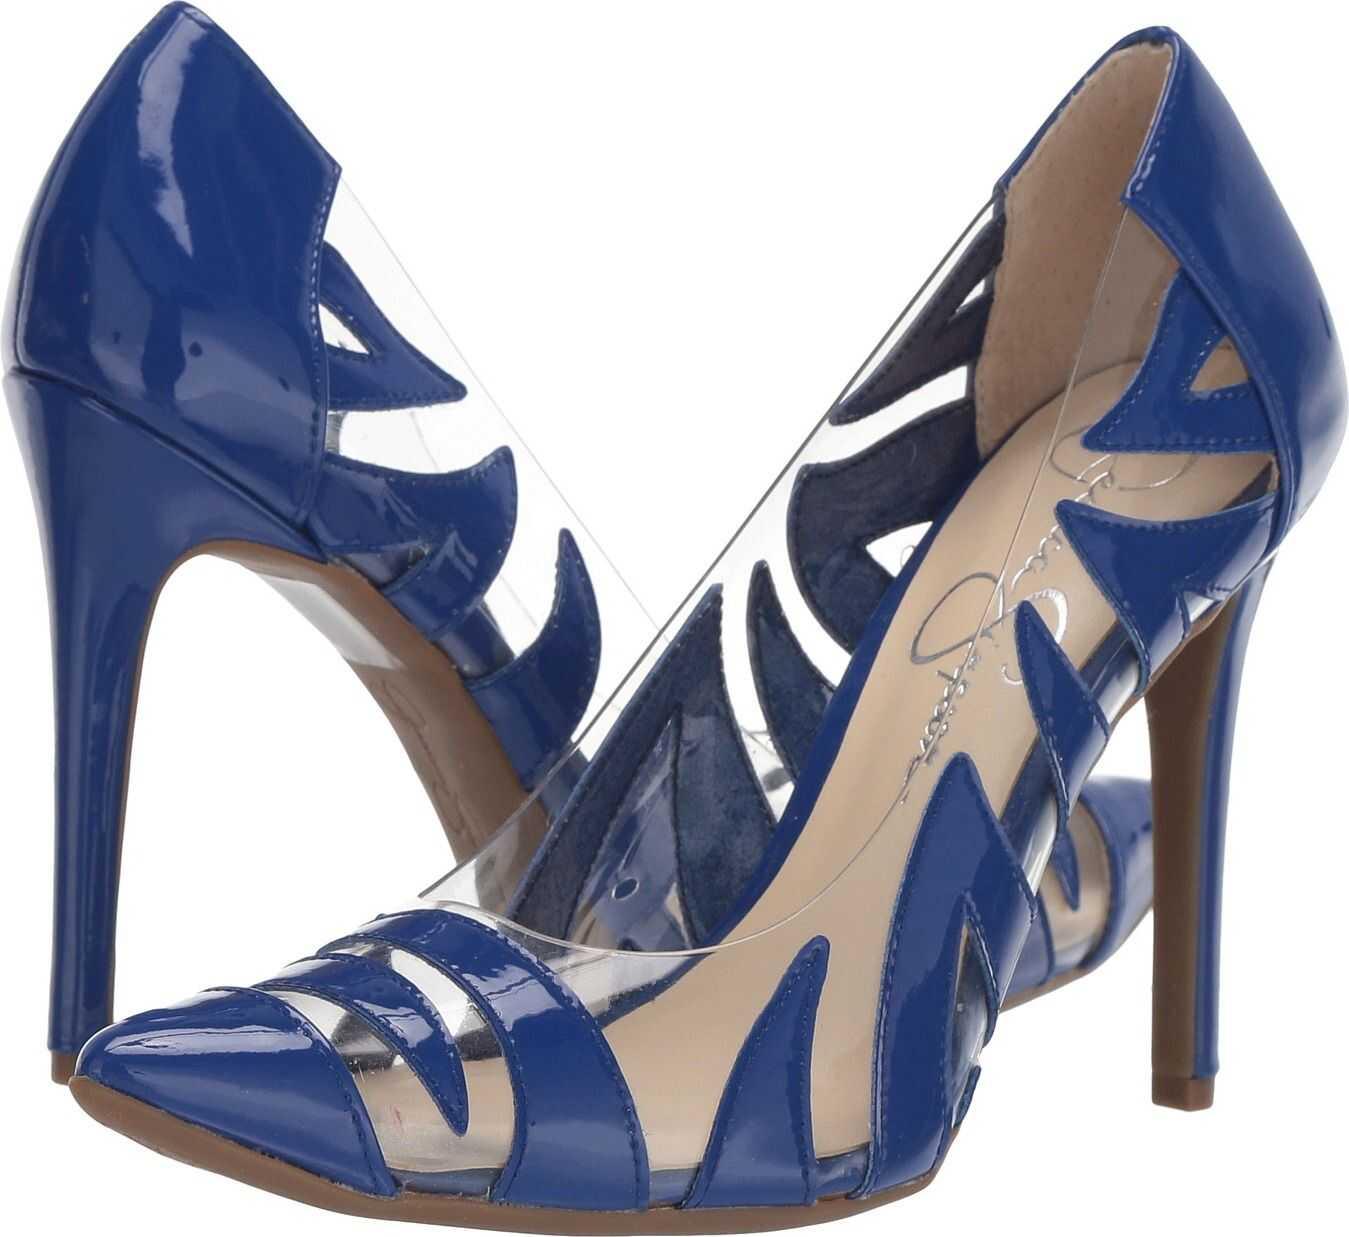 Jessica Simpson Palmra Blue/Violet Super Patent